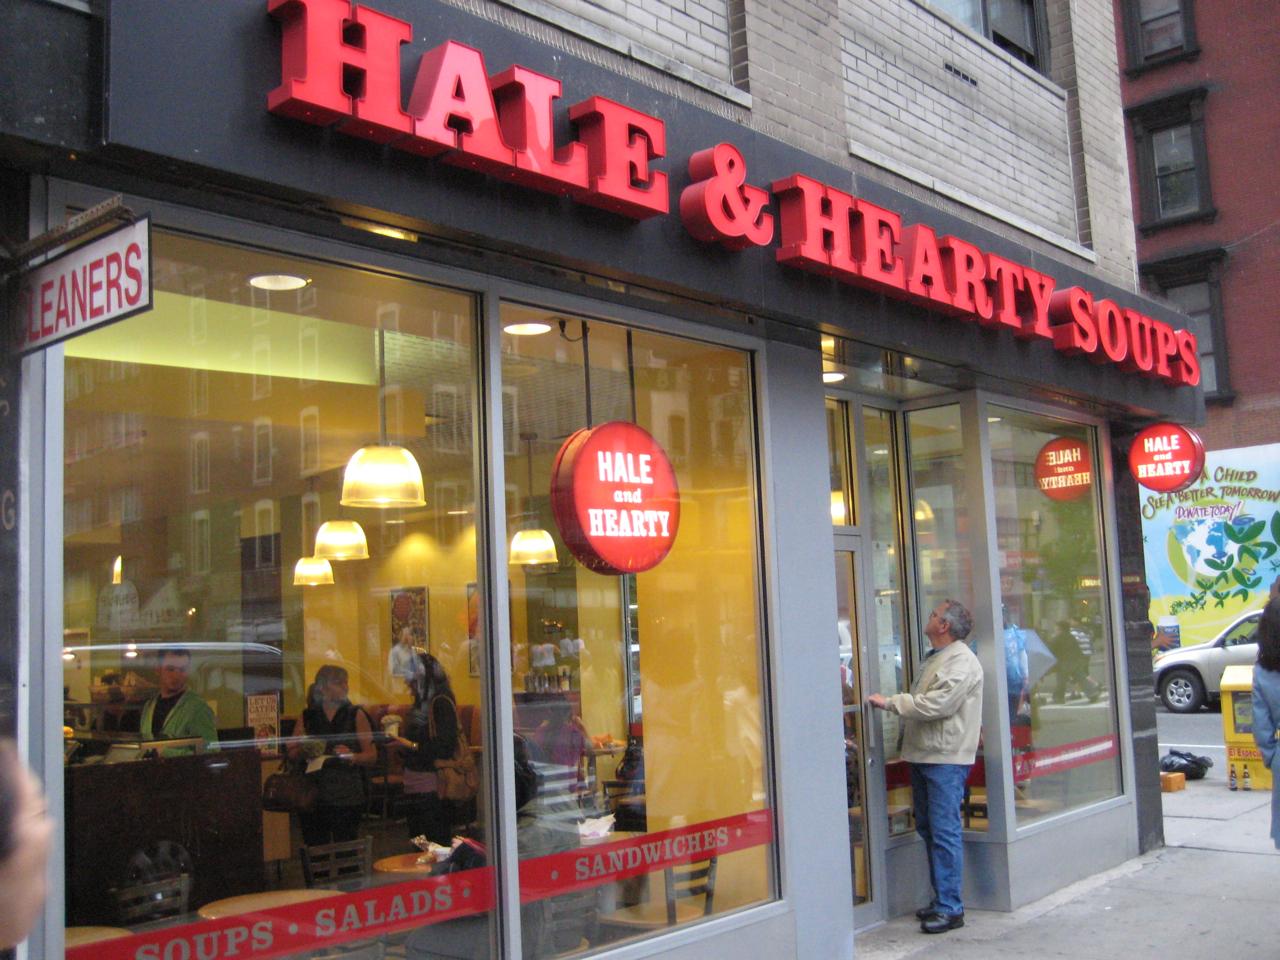 haleandhearty